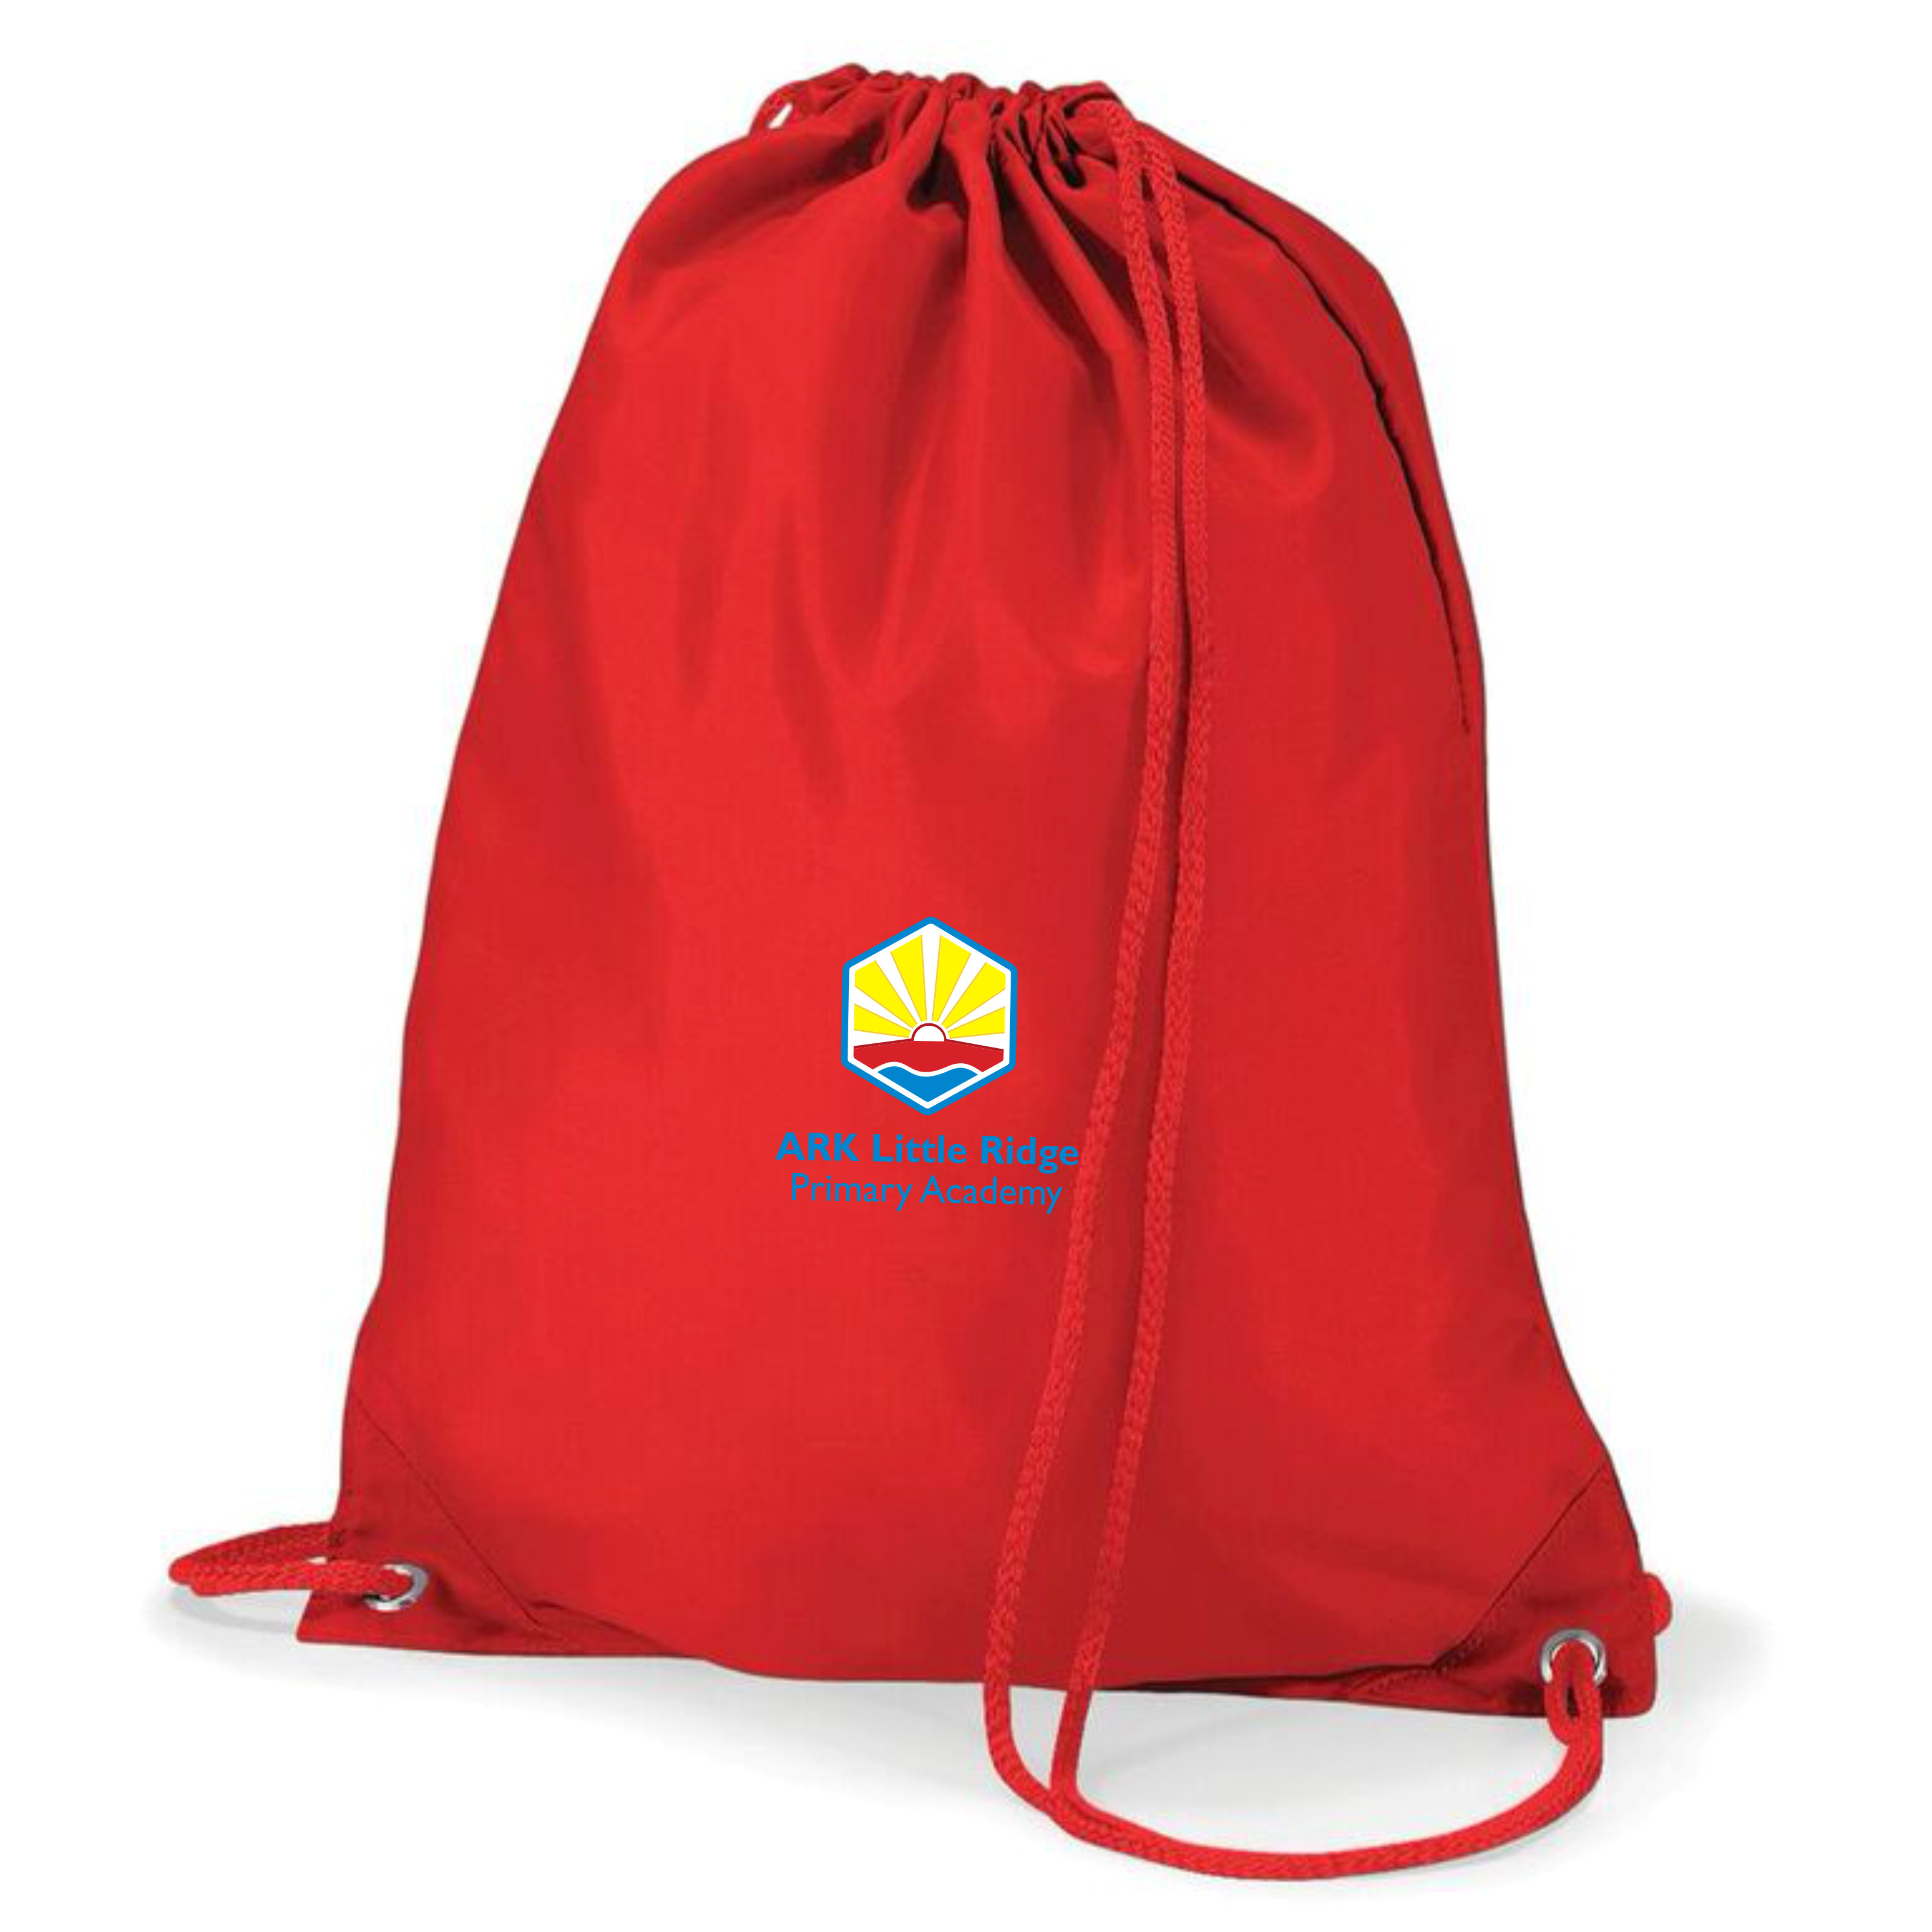 Ark Little Ridge PE Bag - Superstitch 86 c6f9be6772